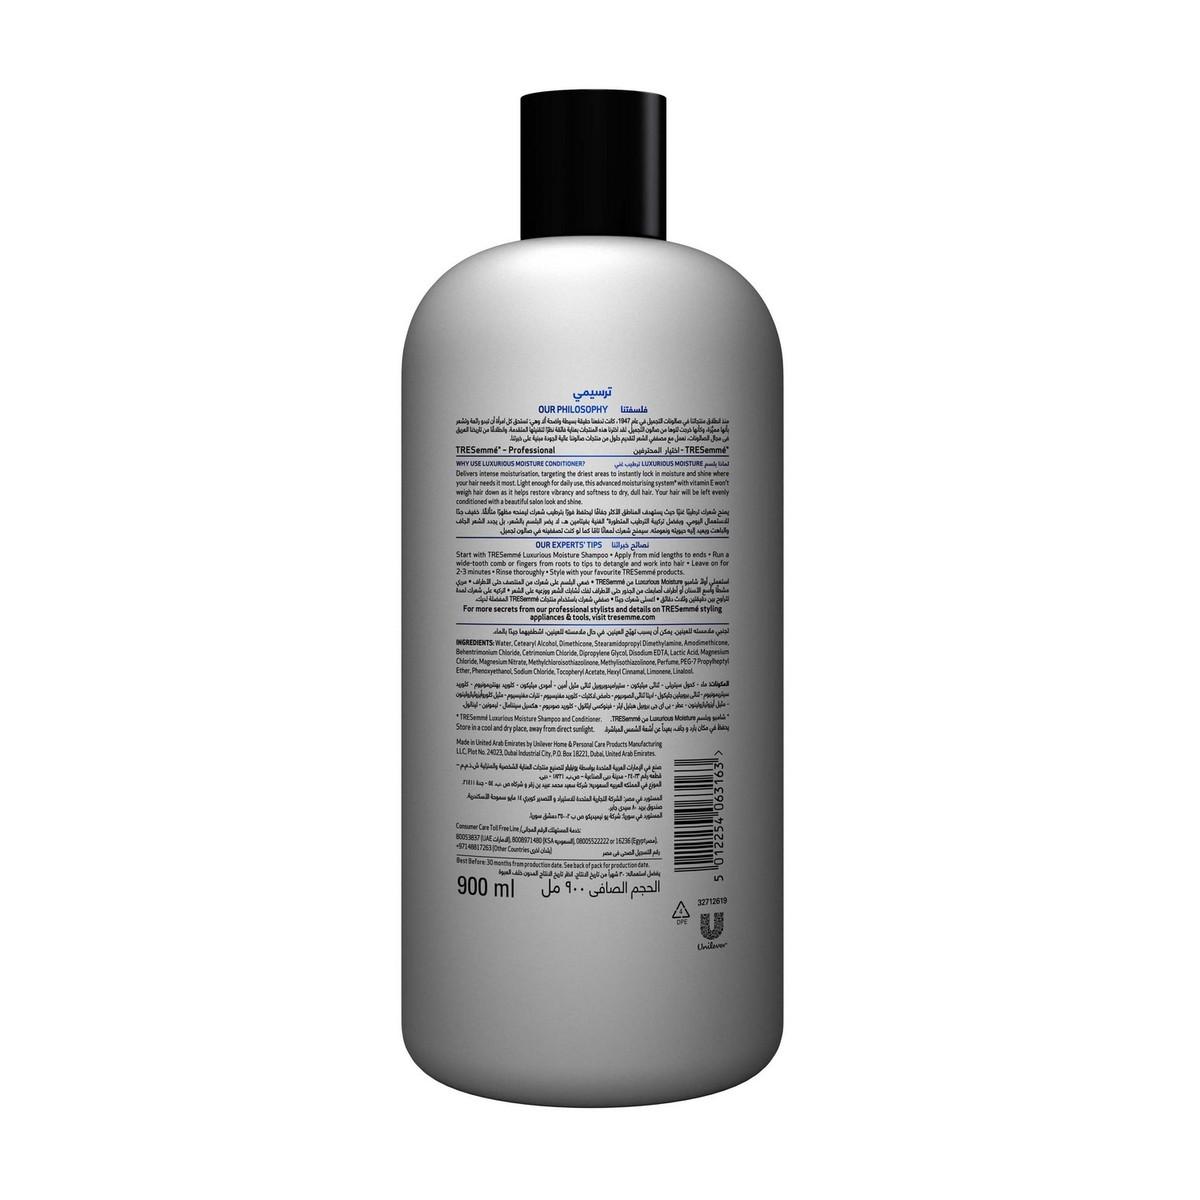 Buy Tresemme Moisture Rich Moisturizing Conditioner 900 ml